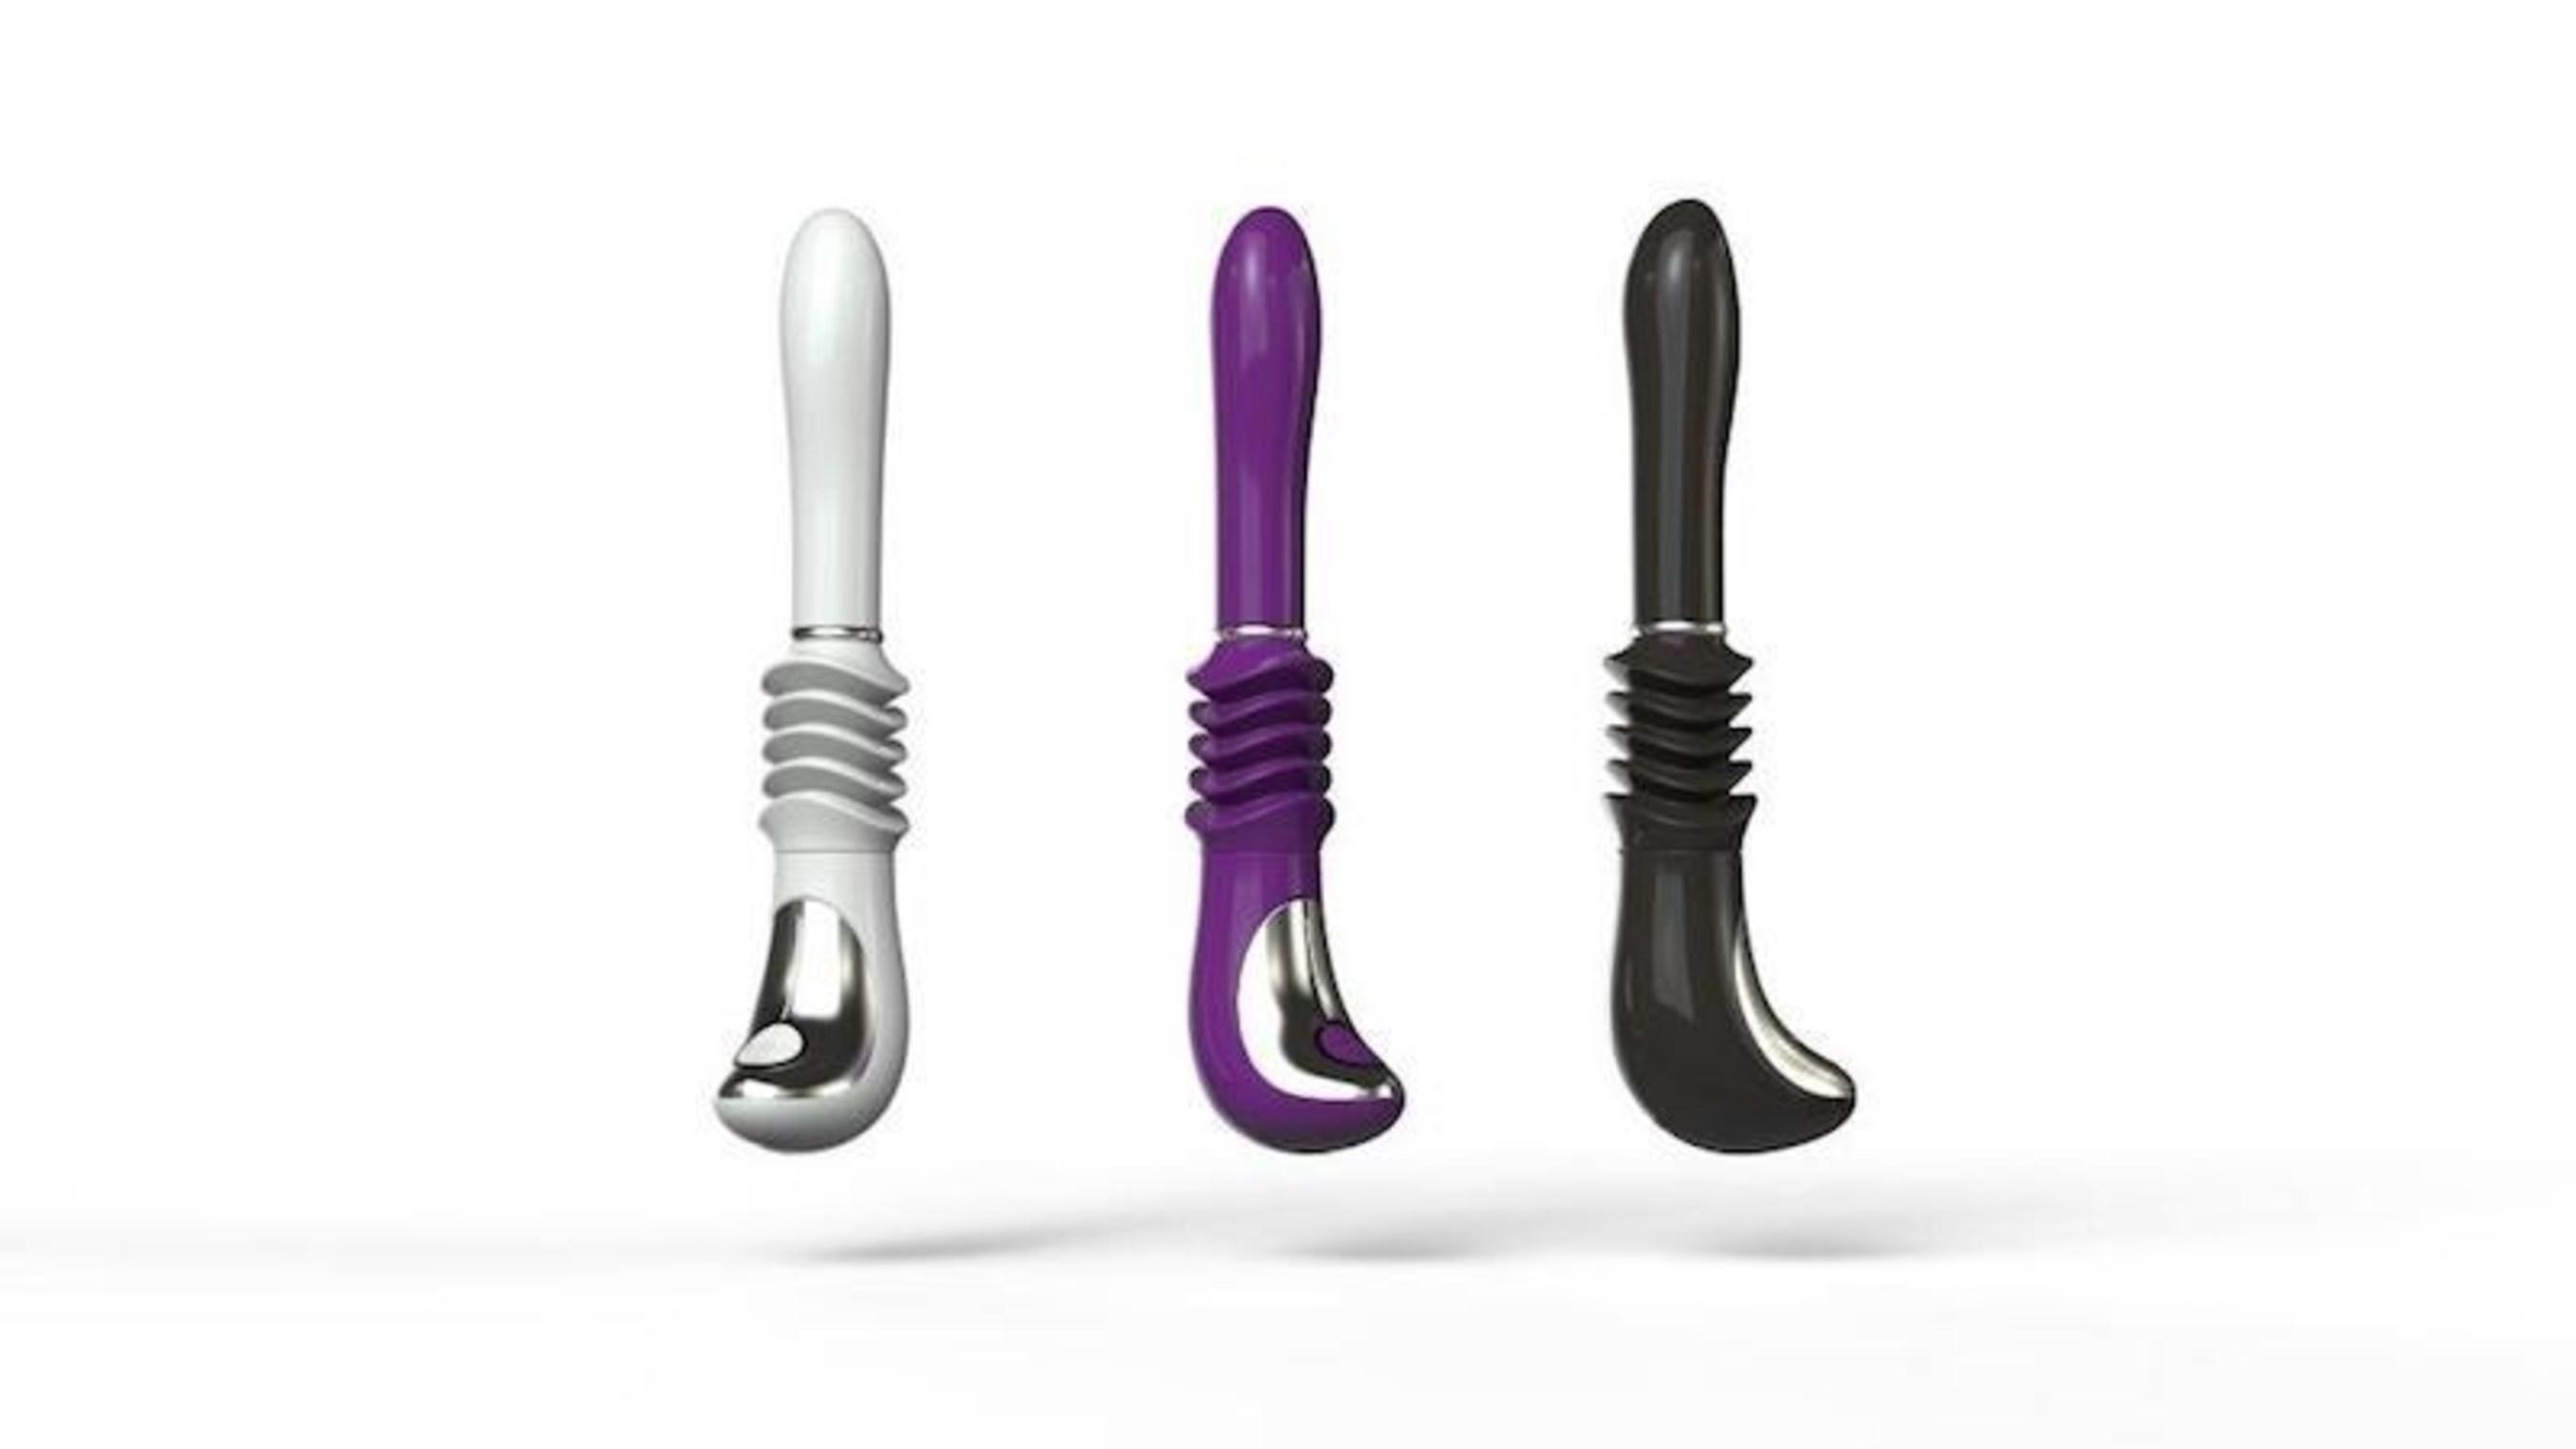 touch massage sex toys for men australia